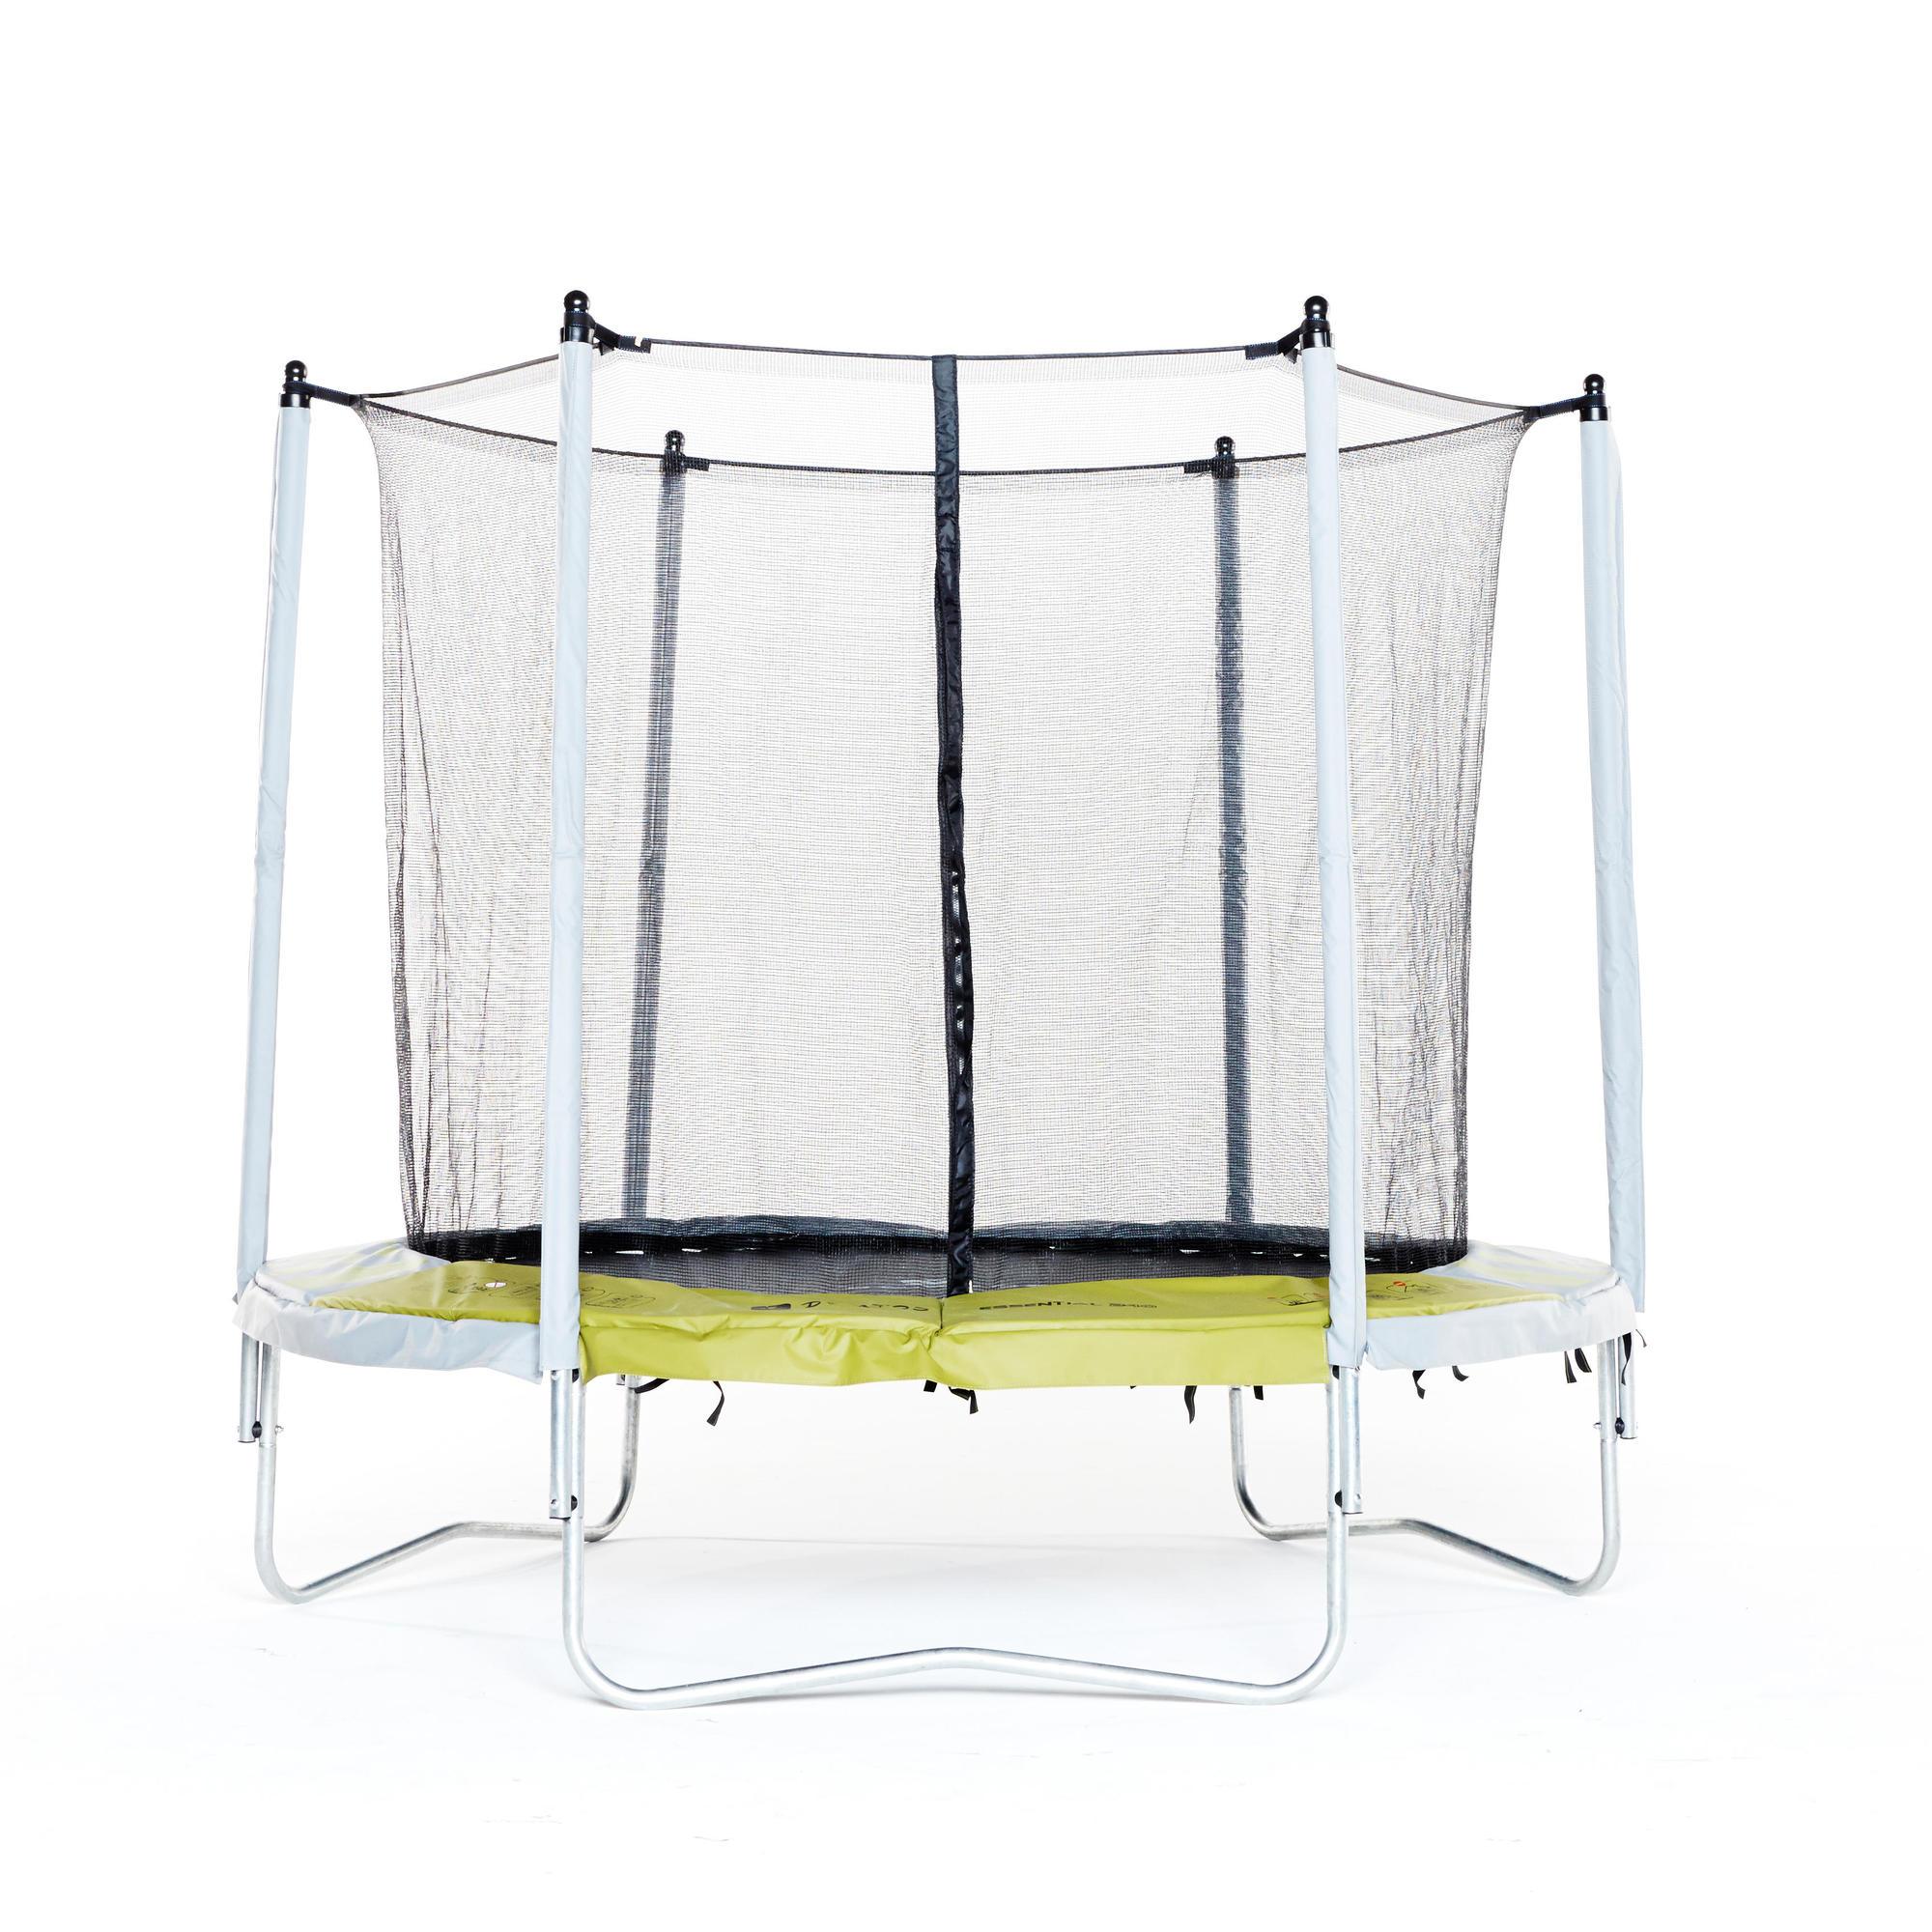 trampoline essential 240 vert filet de protection domyos by decathlon. Black Bedroom Furniture Sets. Home Design Ideas